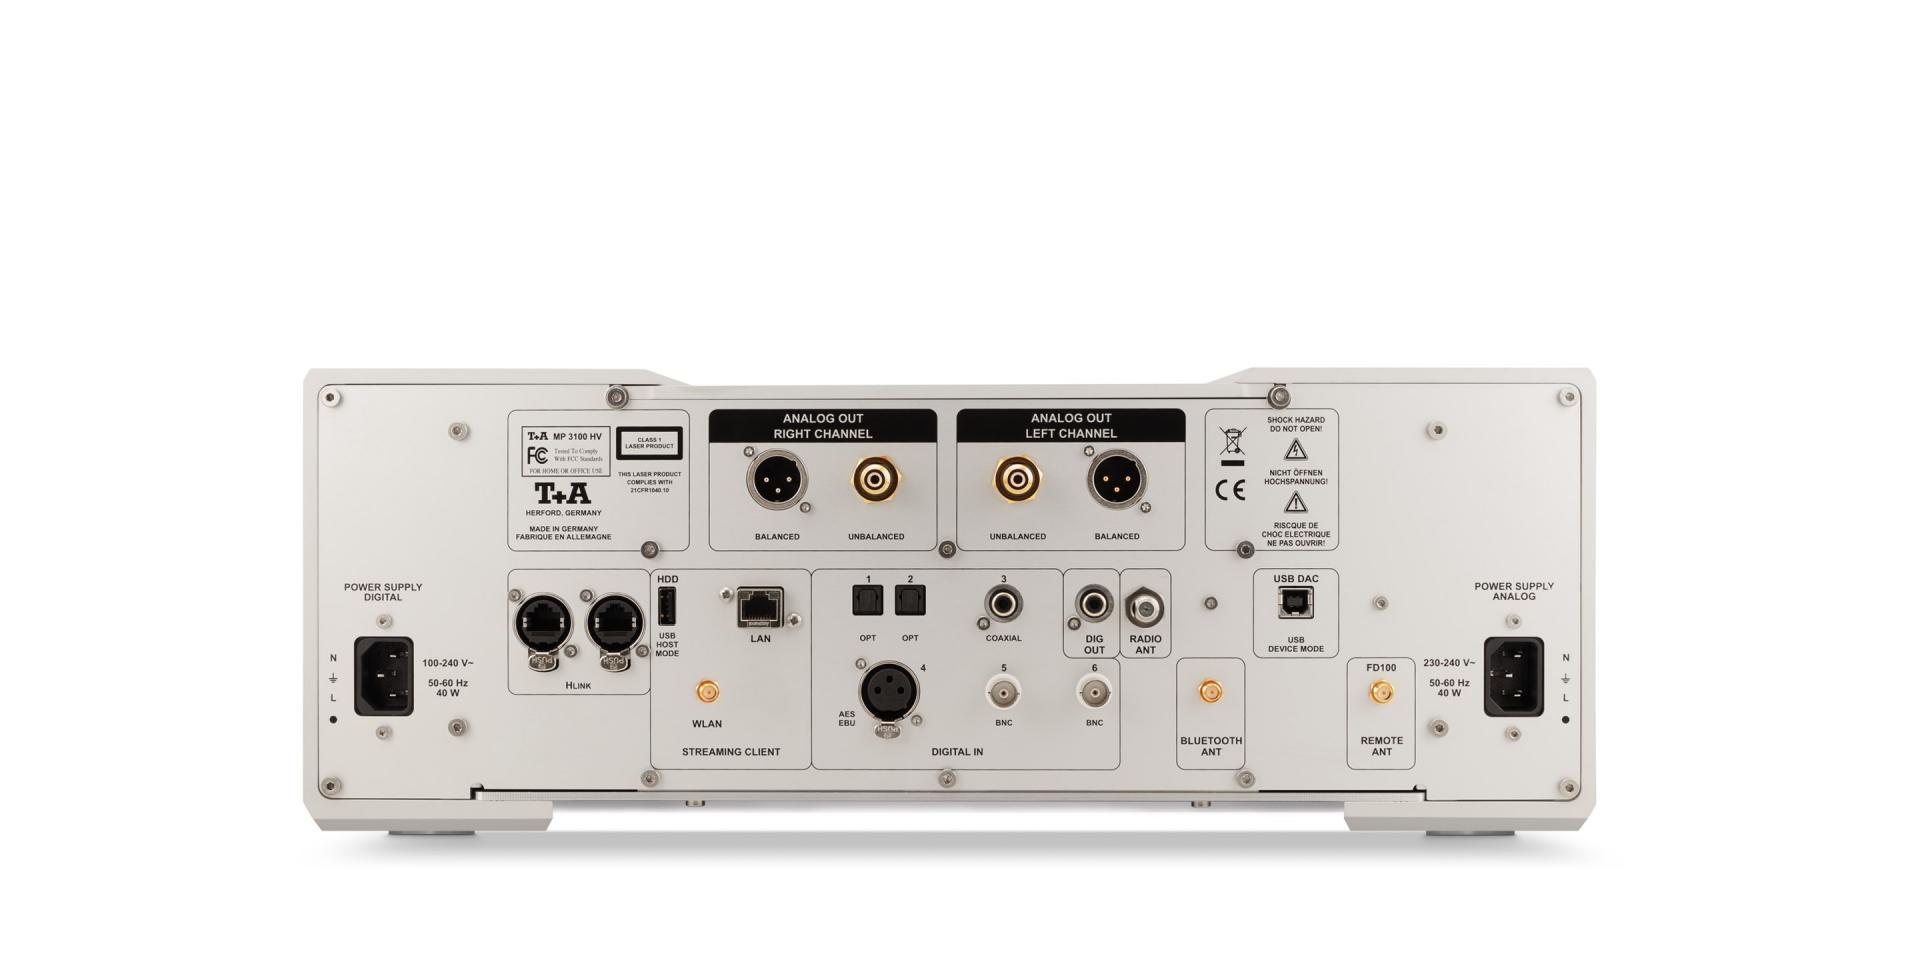 MP 3100 HV Multi-Source SACD Player